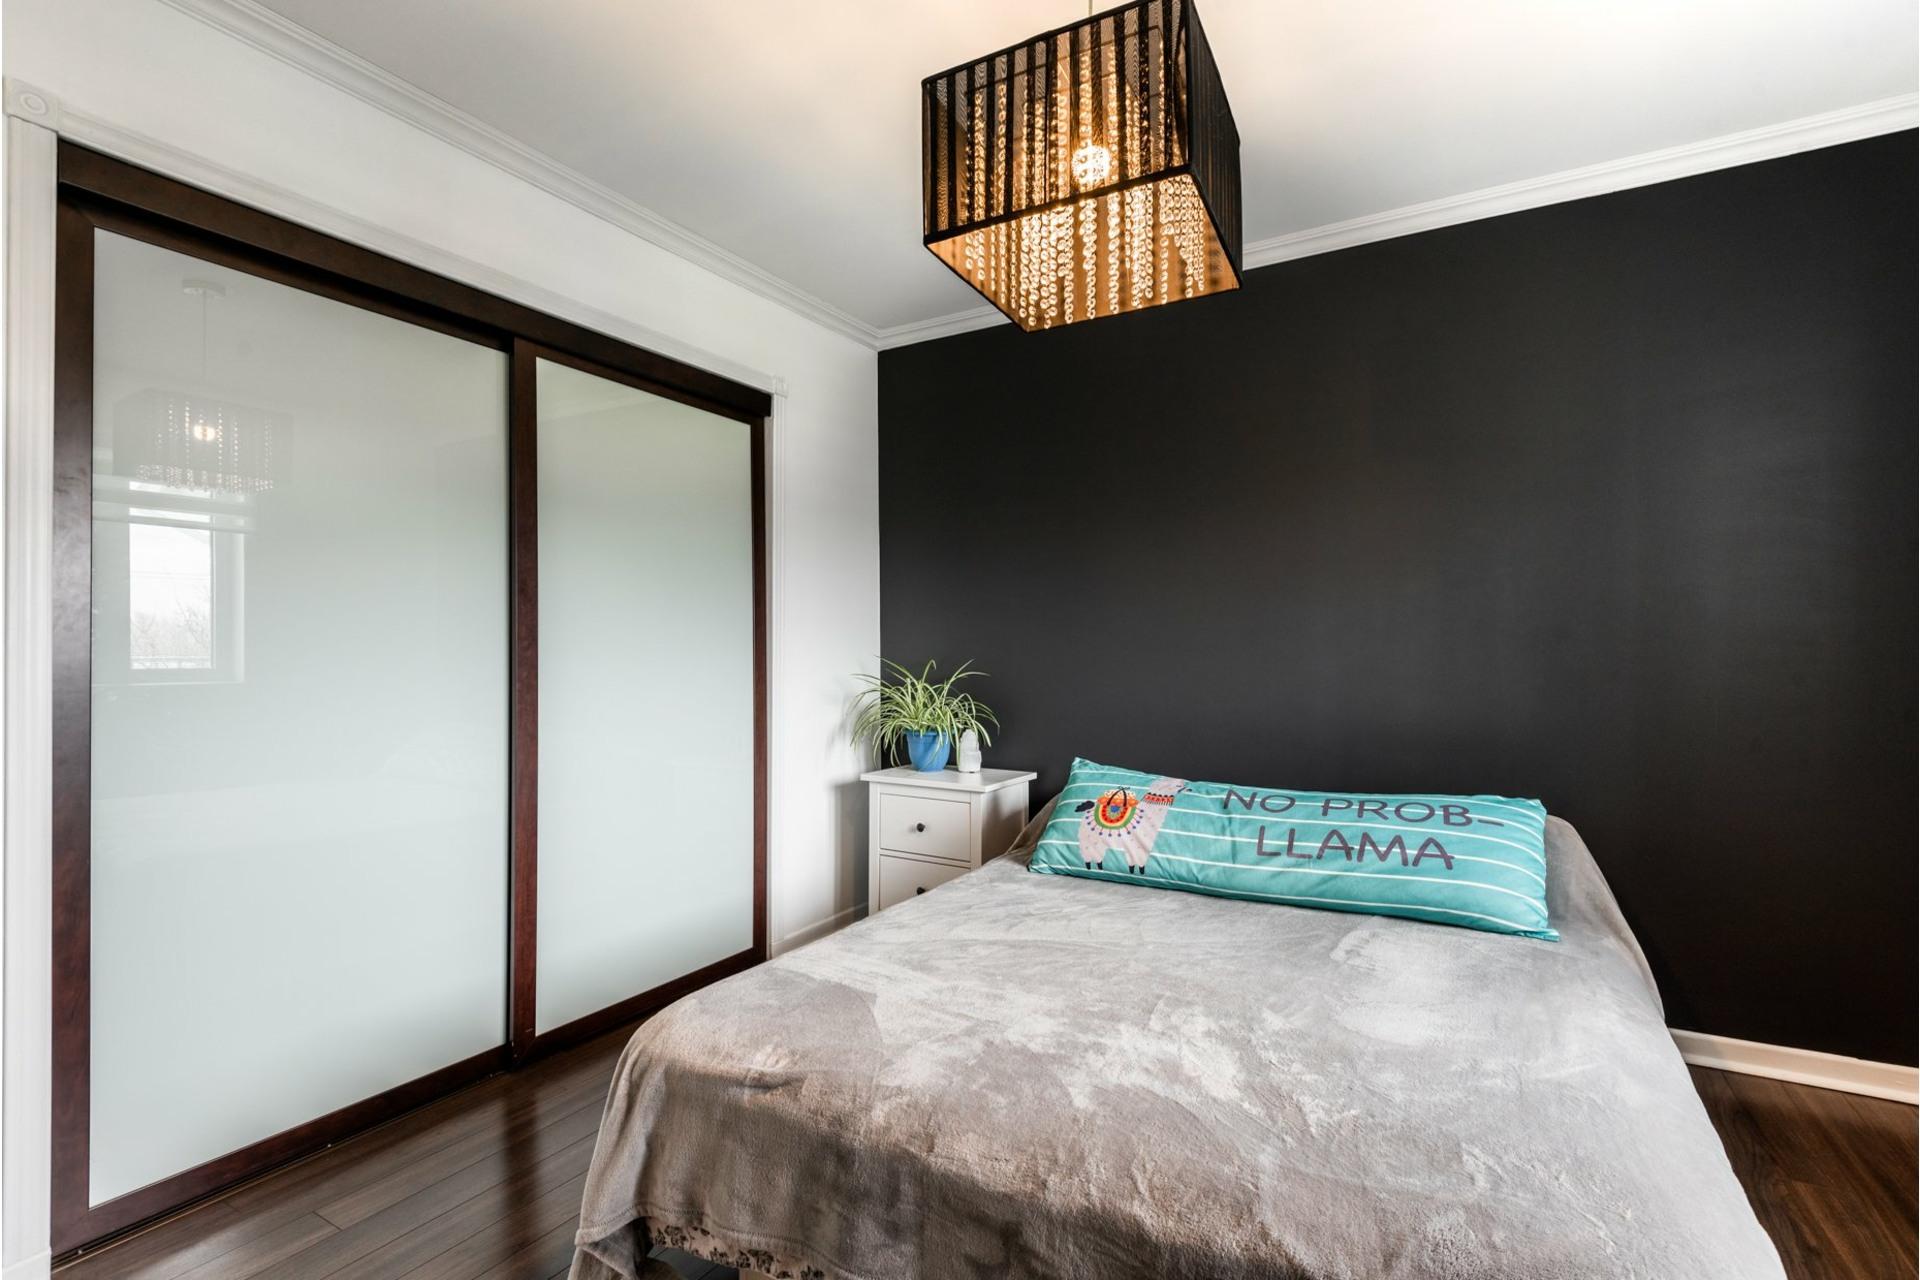 image 13 - Apartment For sale Saint-Hubert Longueuil  - 4 rooms